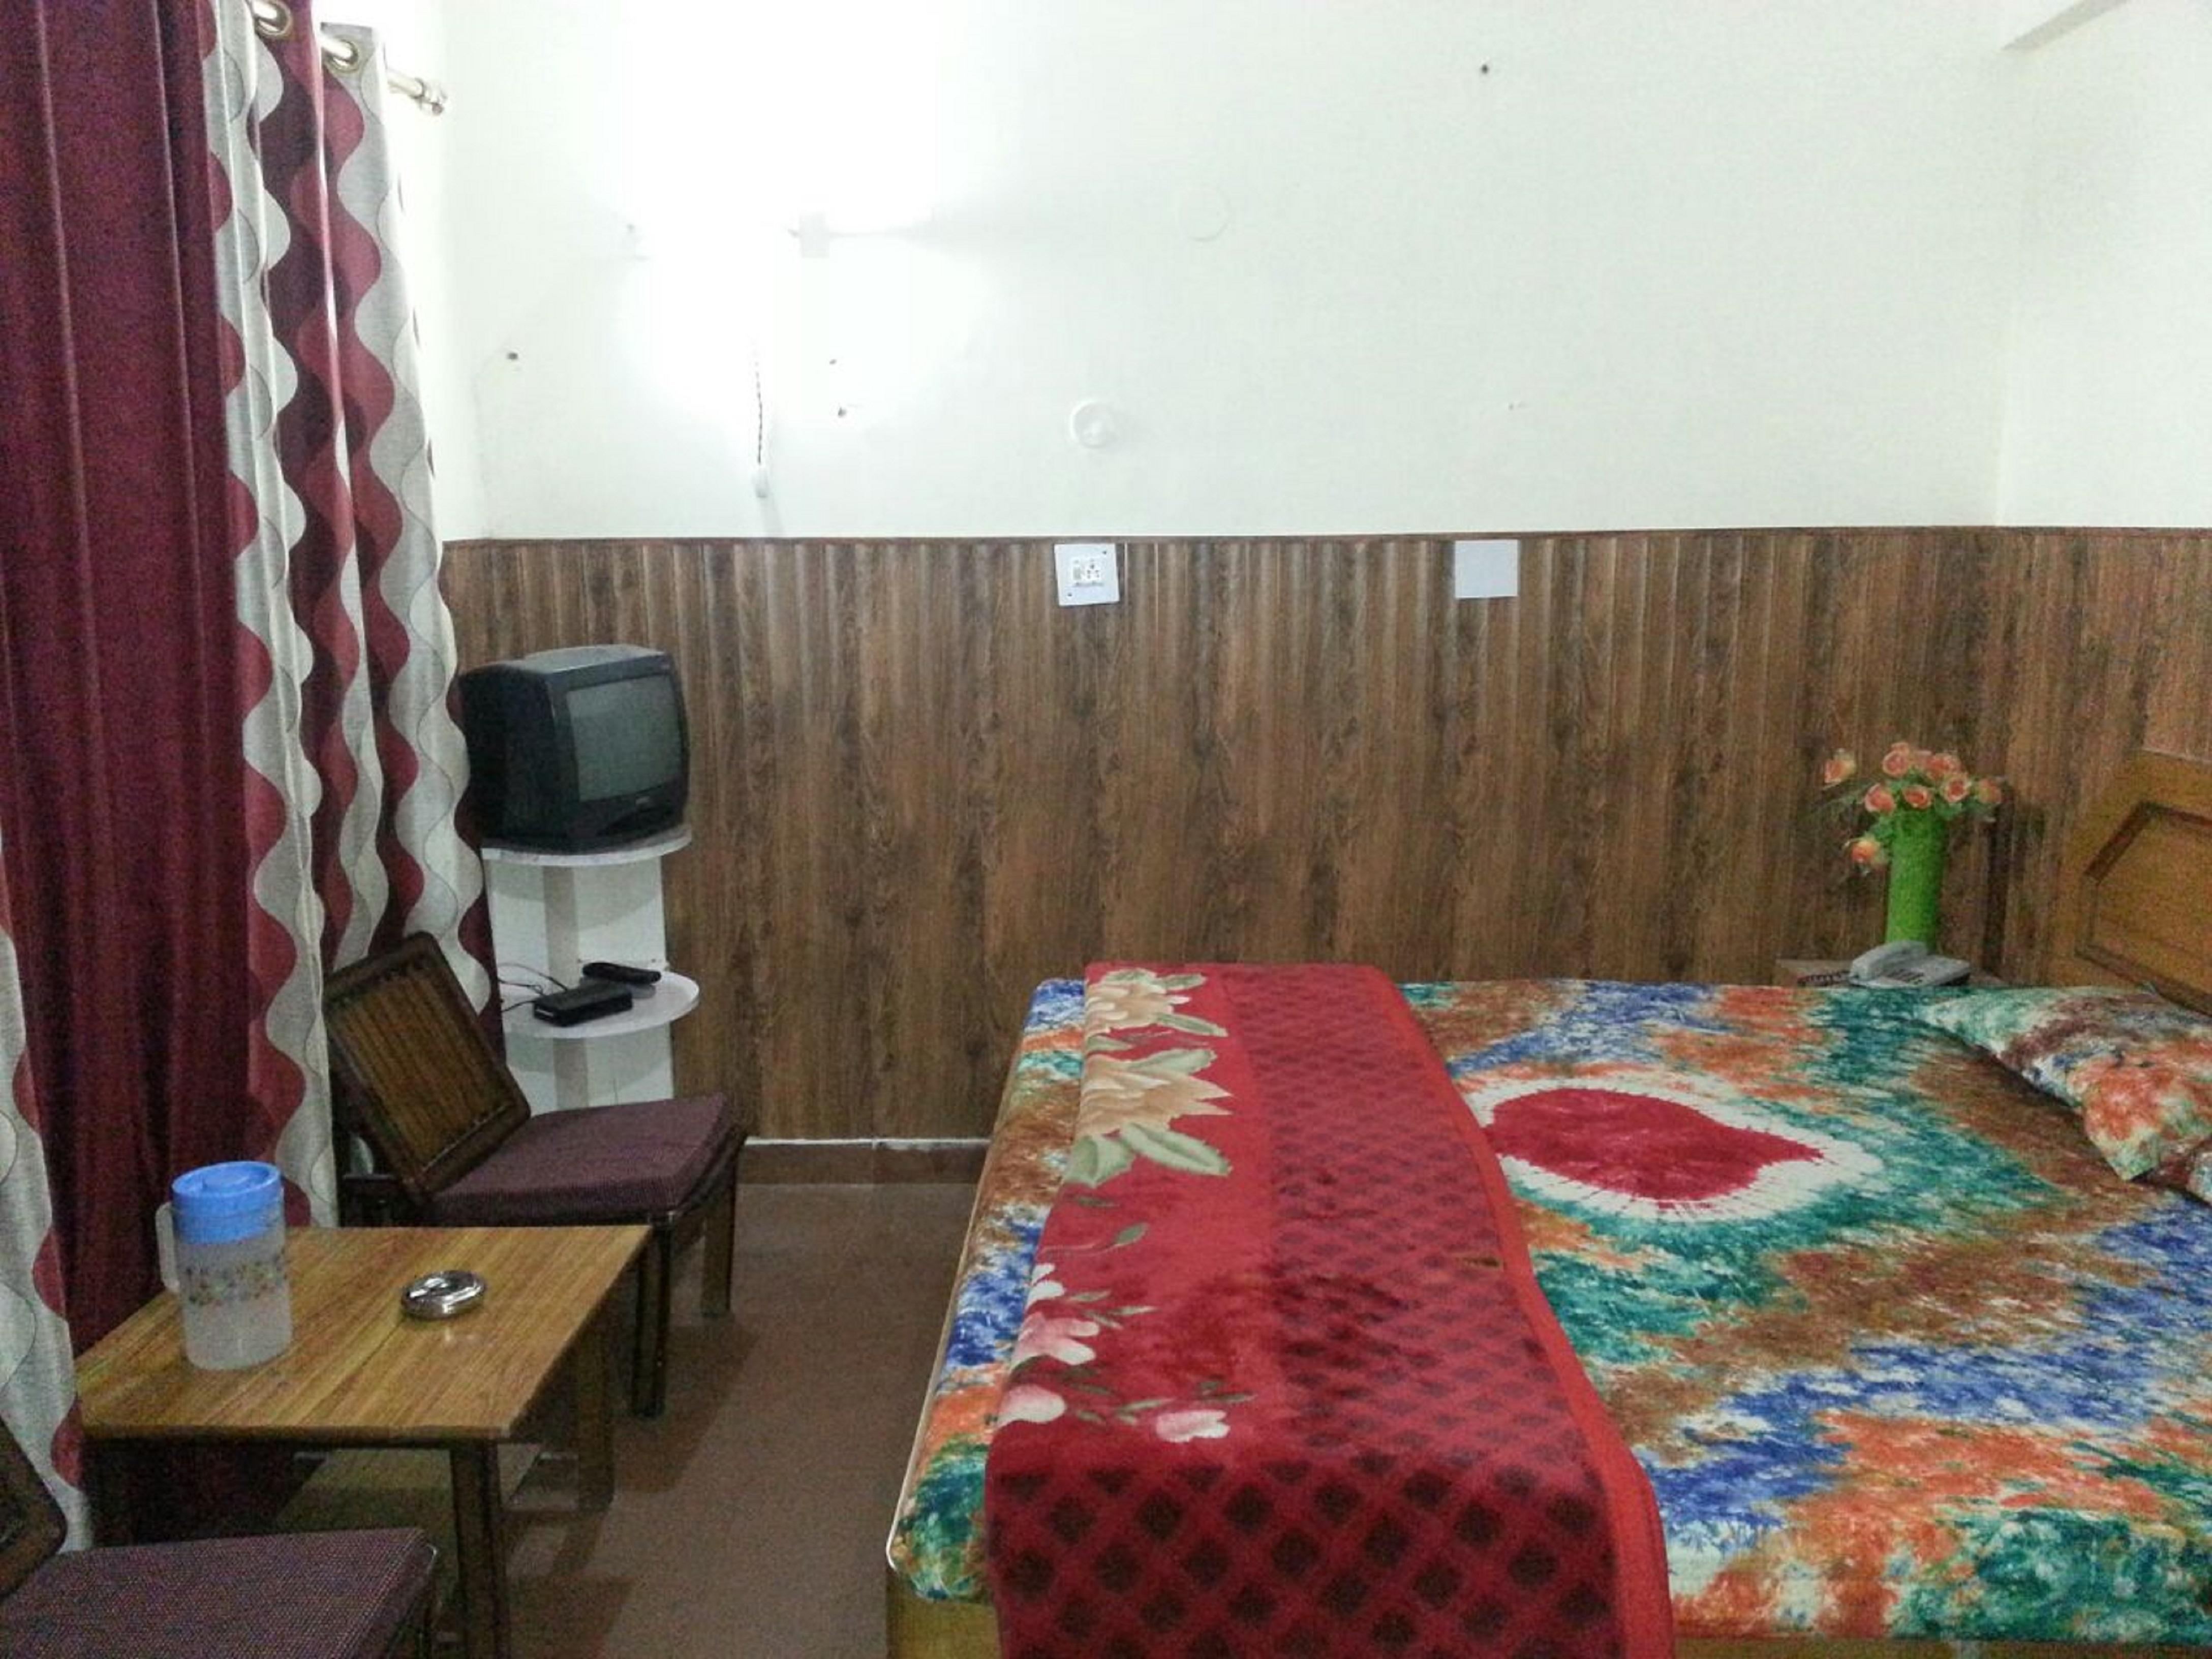 Hotel Hill Bloom in shimla